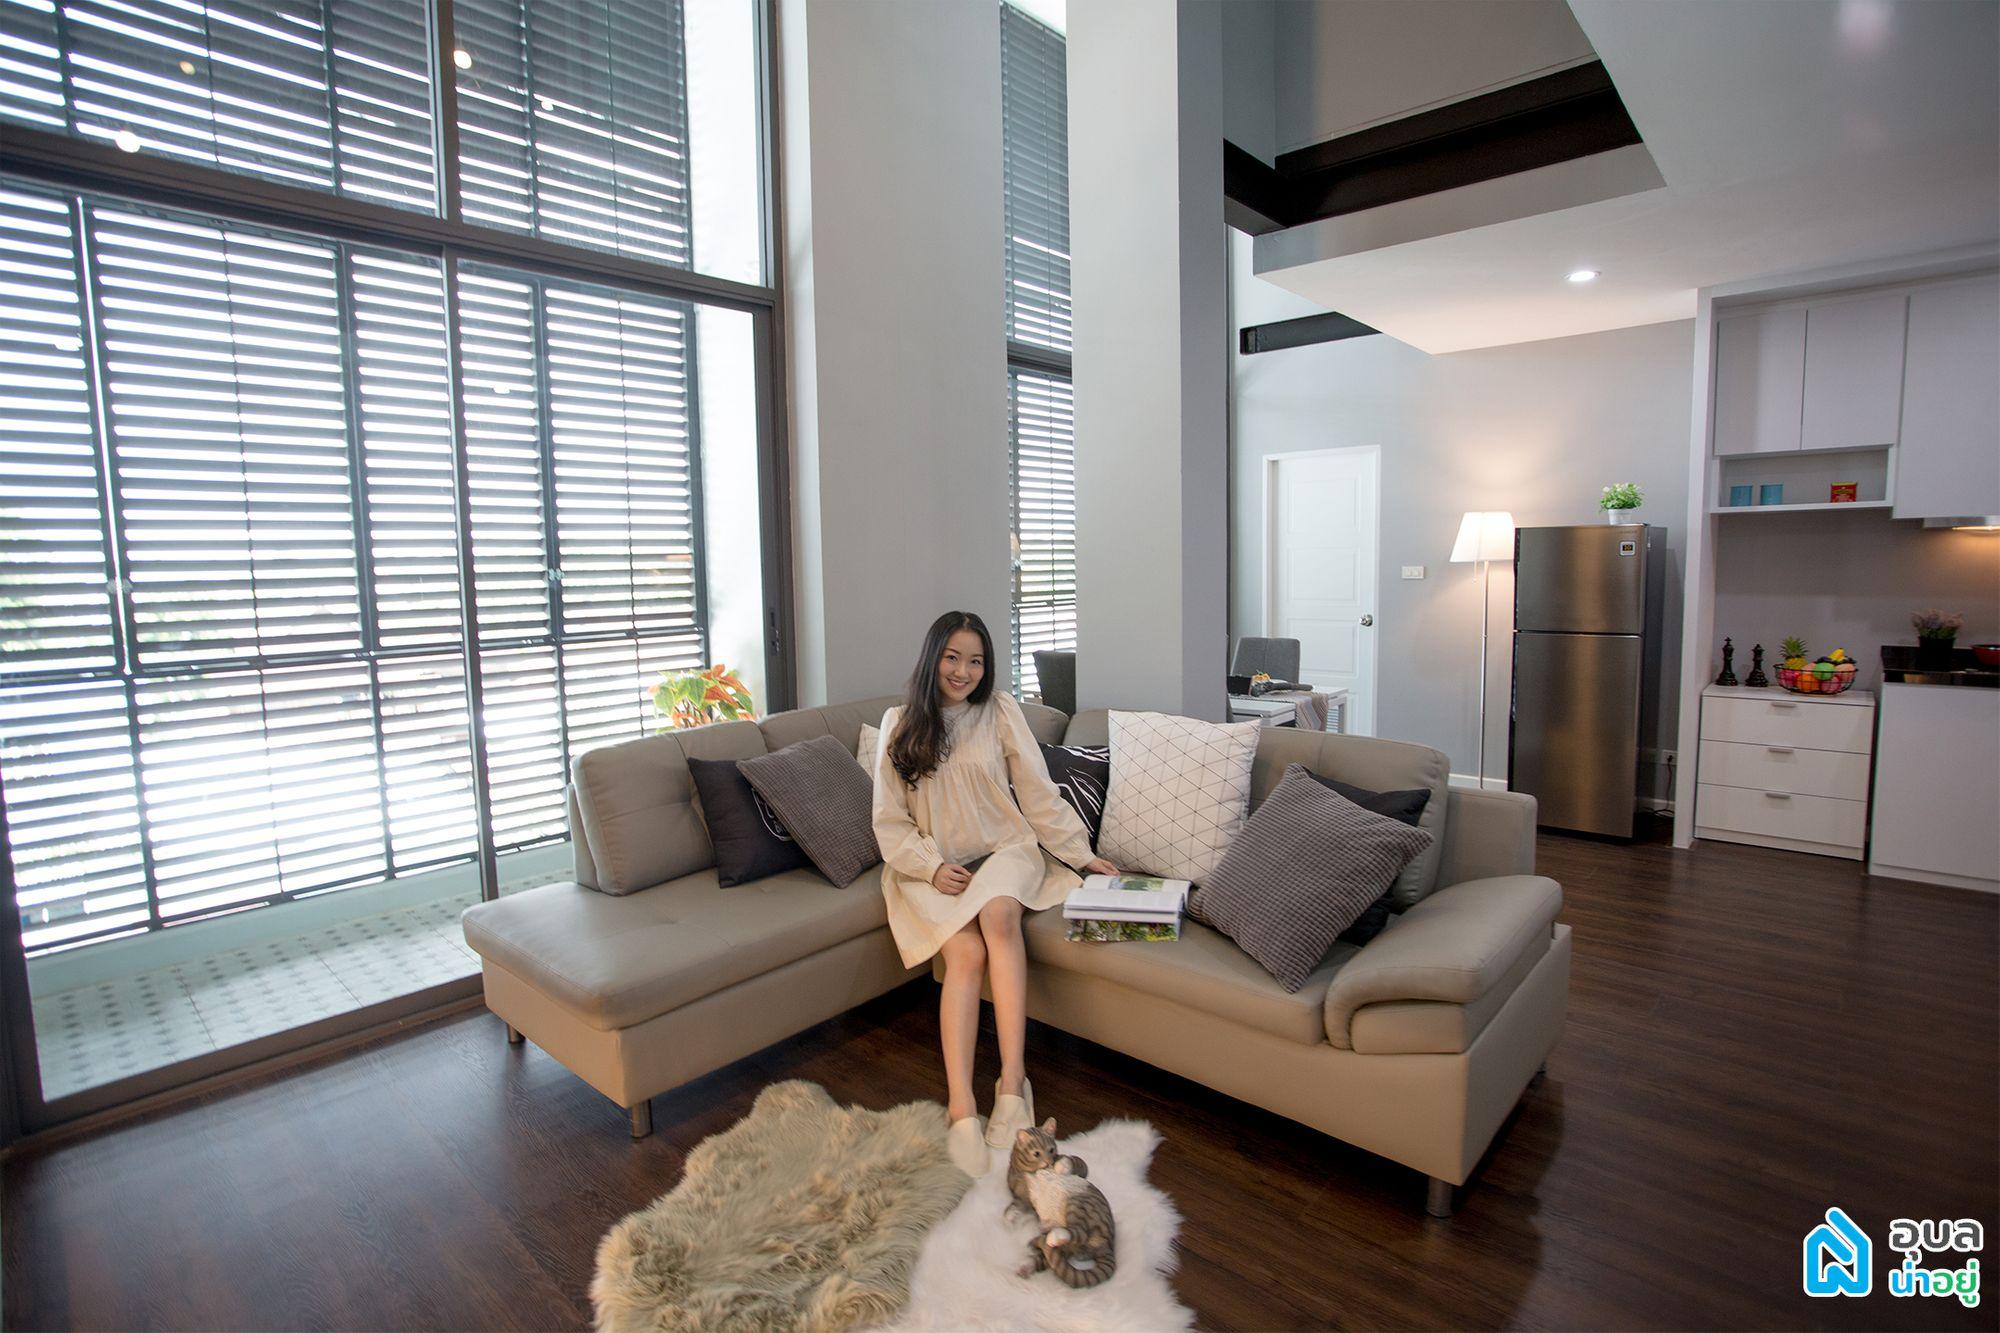 Penta P Residence - Duplex